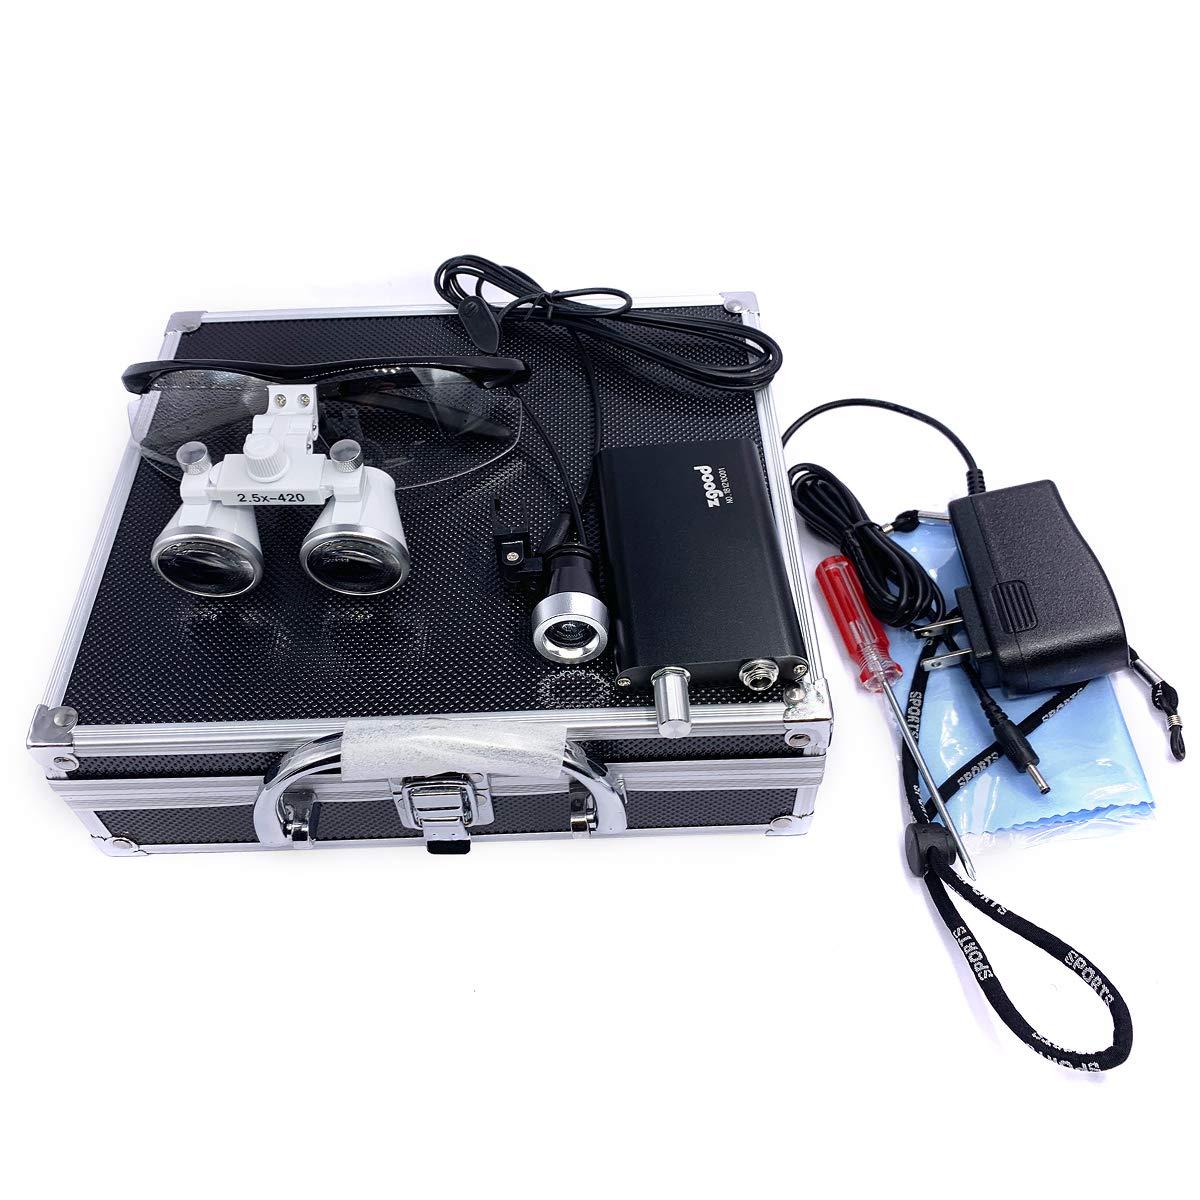 Zgood Portable Surgical Medical Binocular Loupes 2.5×420mm Optical Glasses with 3W LED Headlight Lamp + Aluminum Box (Black)